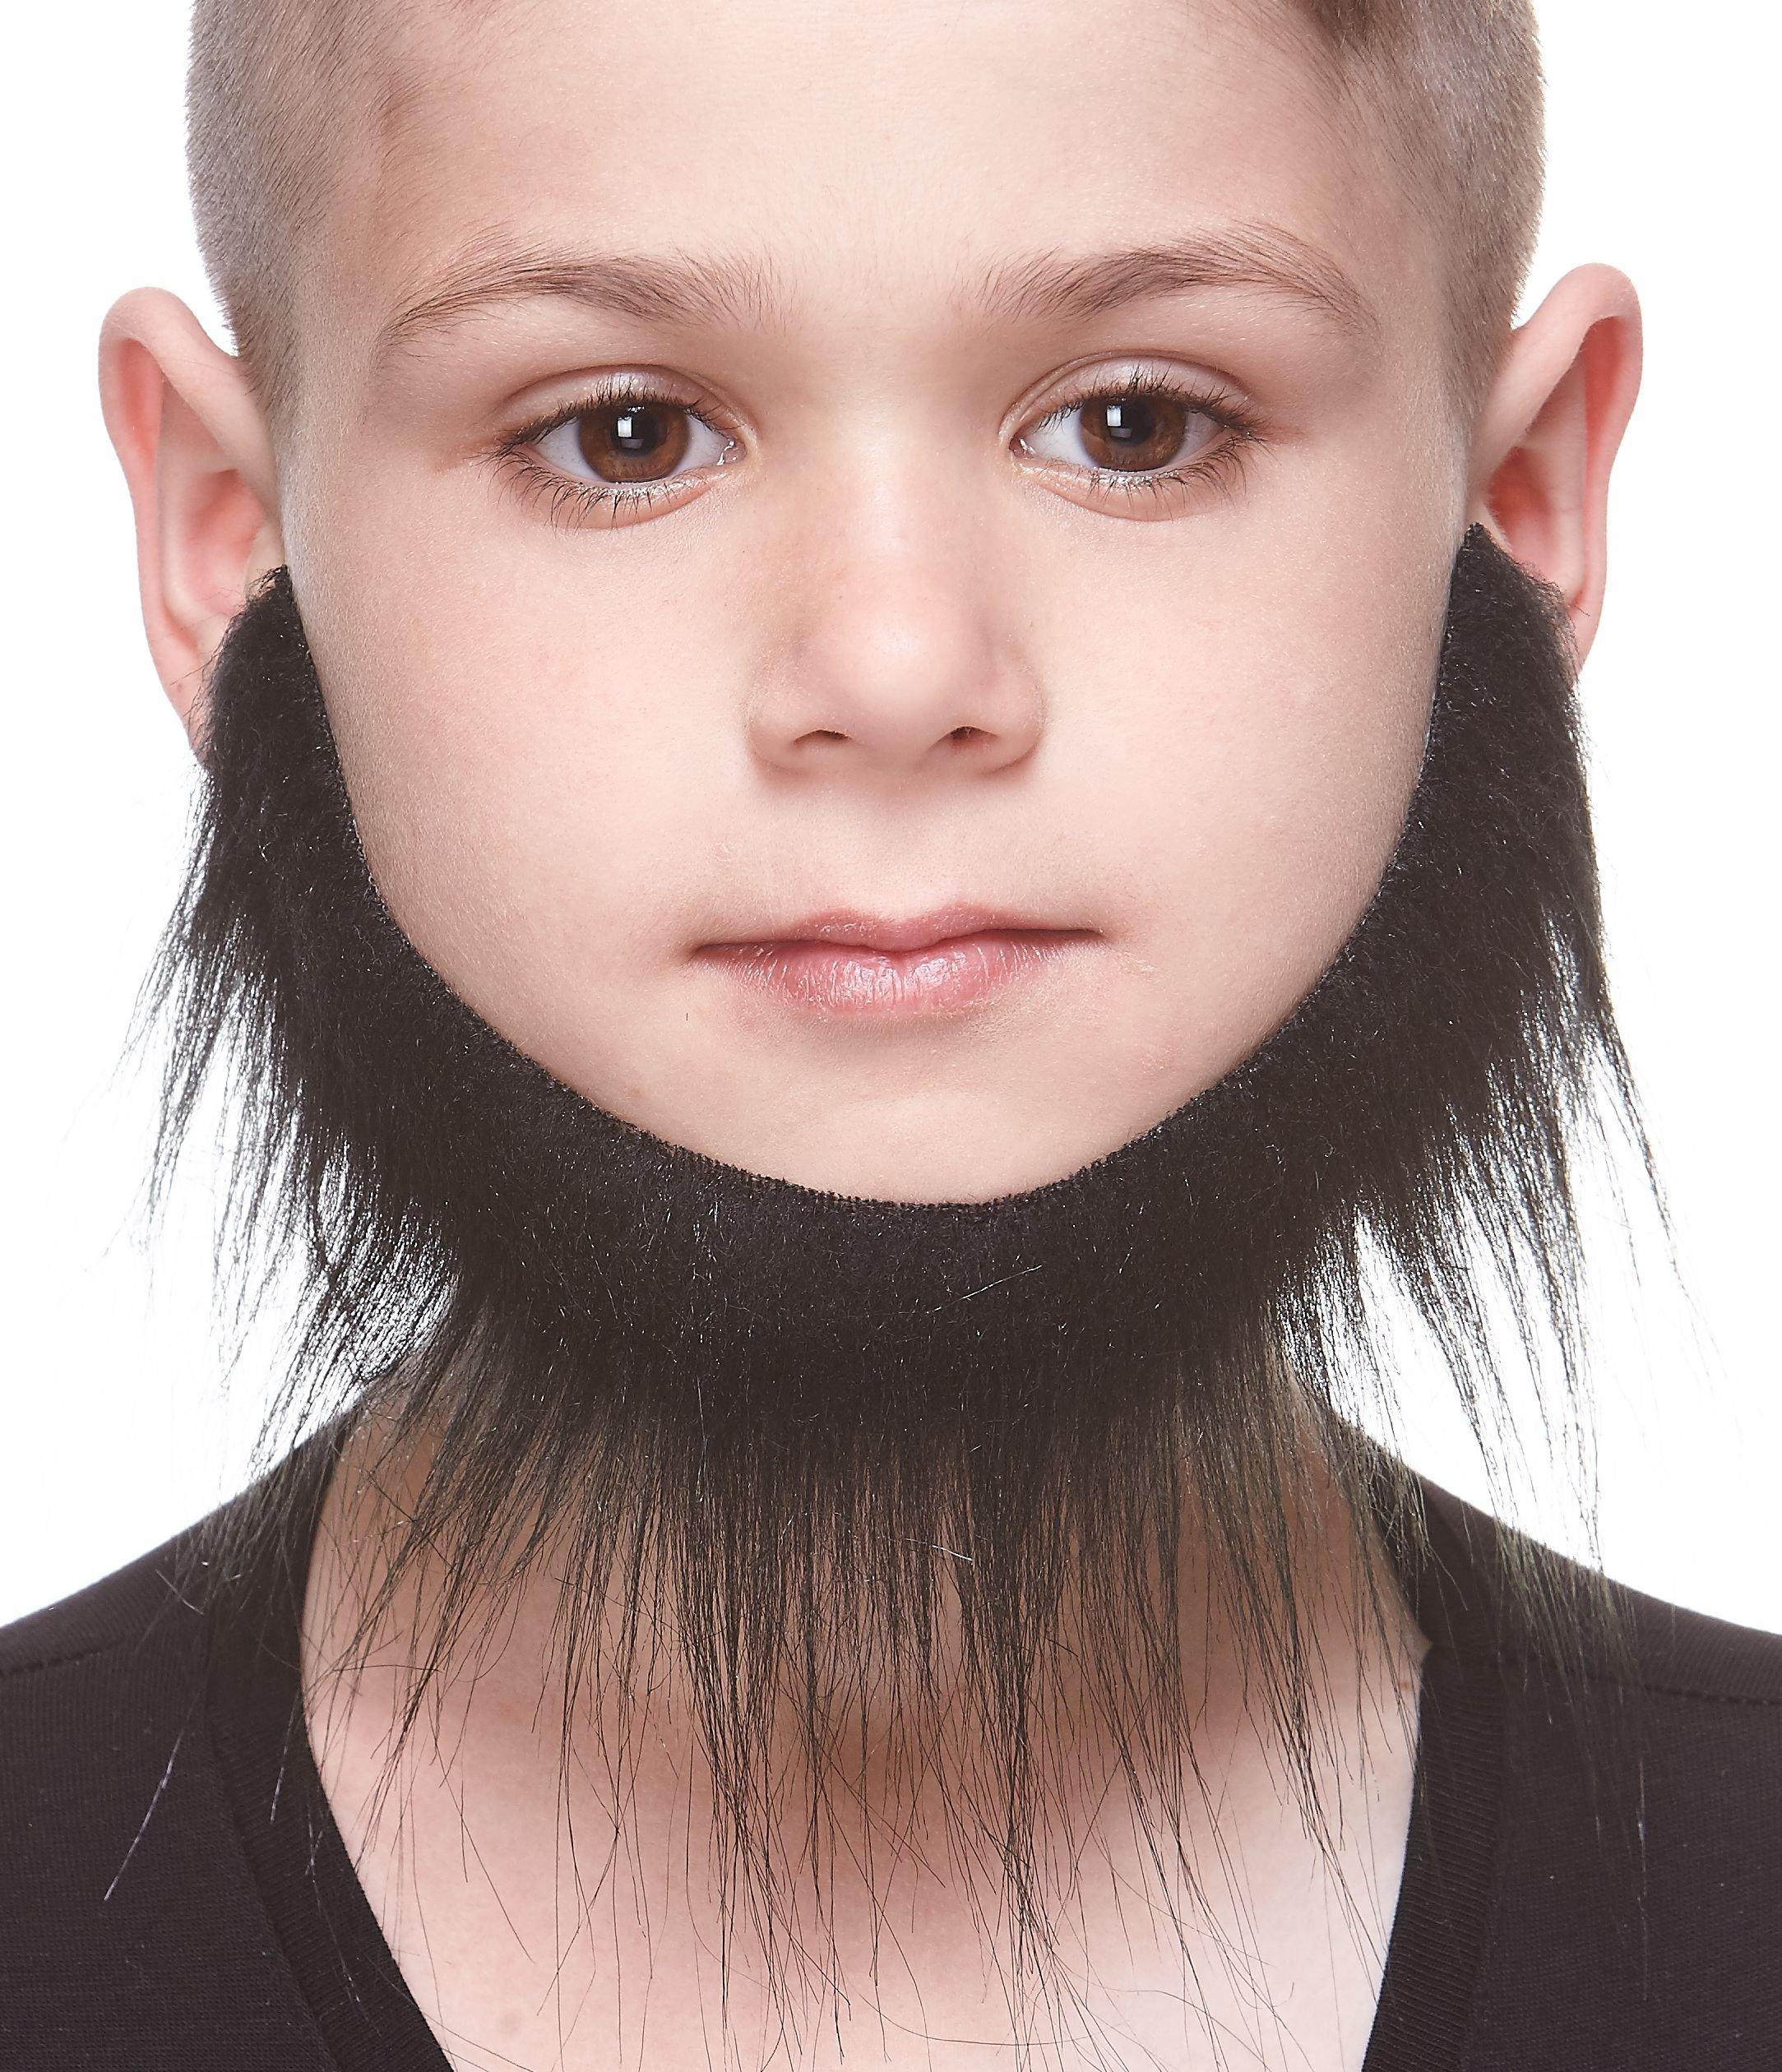 Mustaches Fake Beard, Self Adhesive, Novelty, Small Morman False Facial Hair, Costume Accessory for Kids